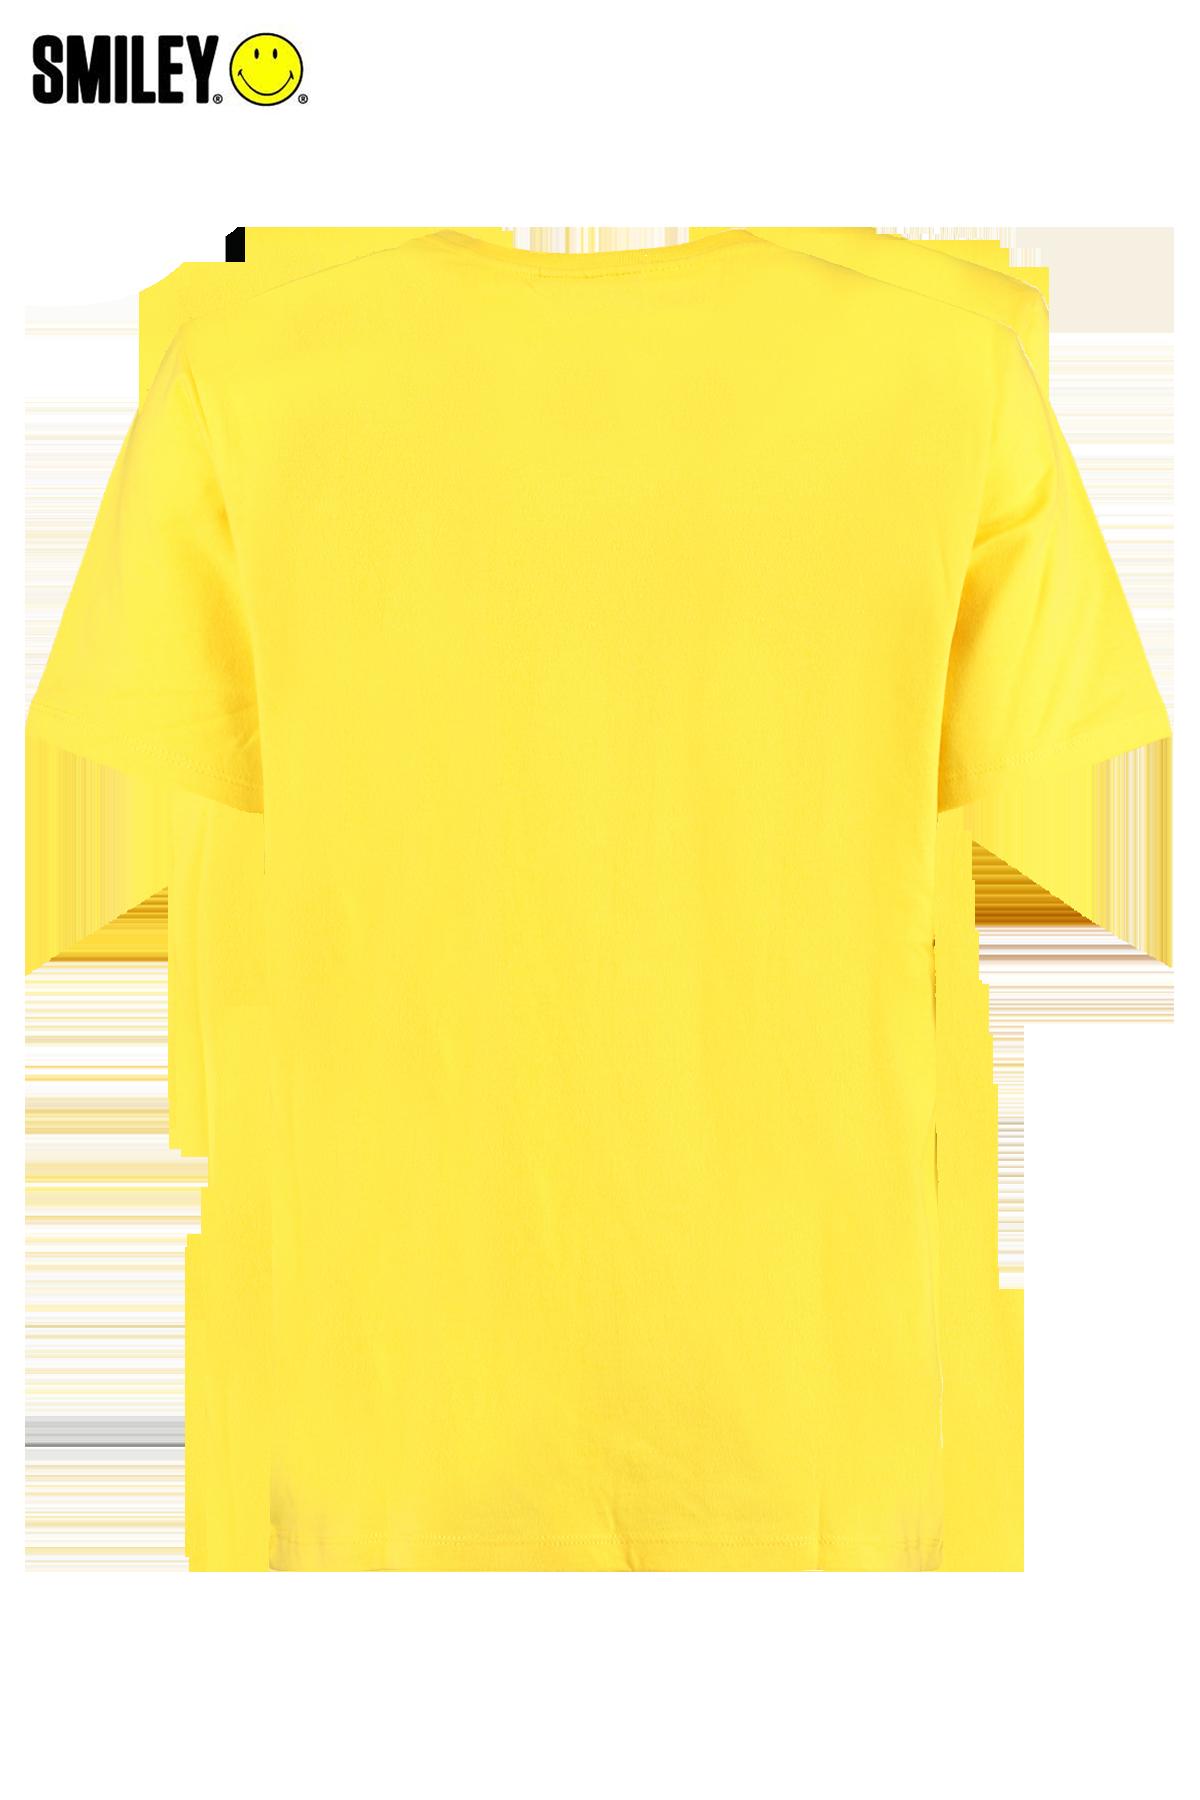 T-shirt Echo original